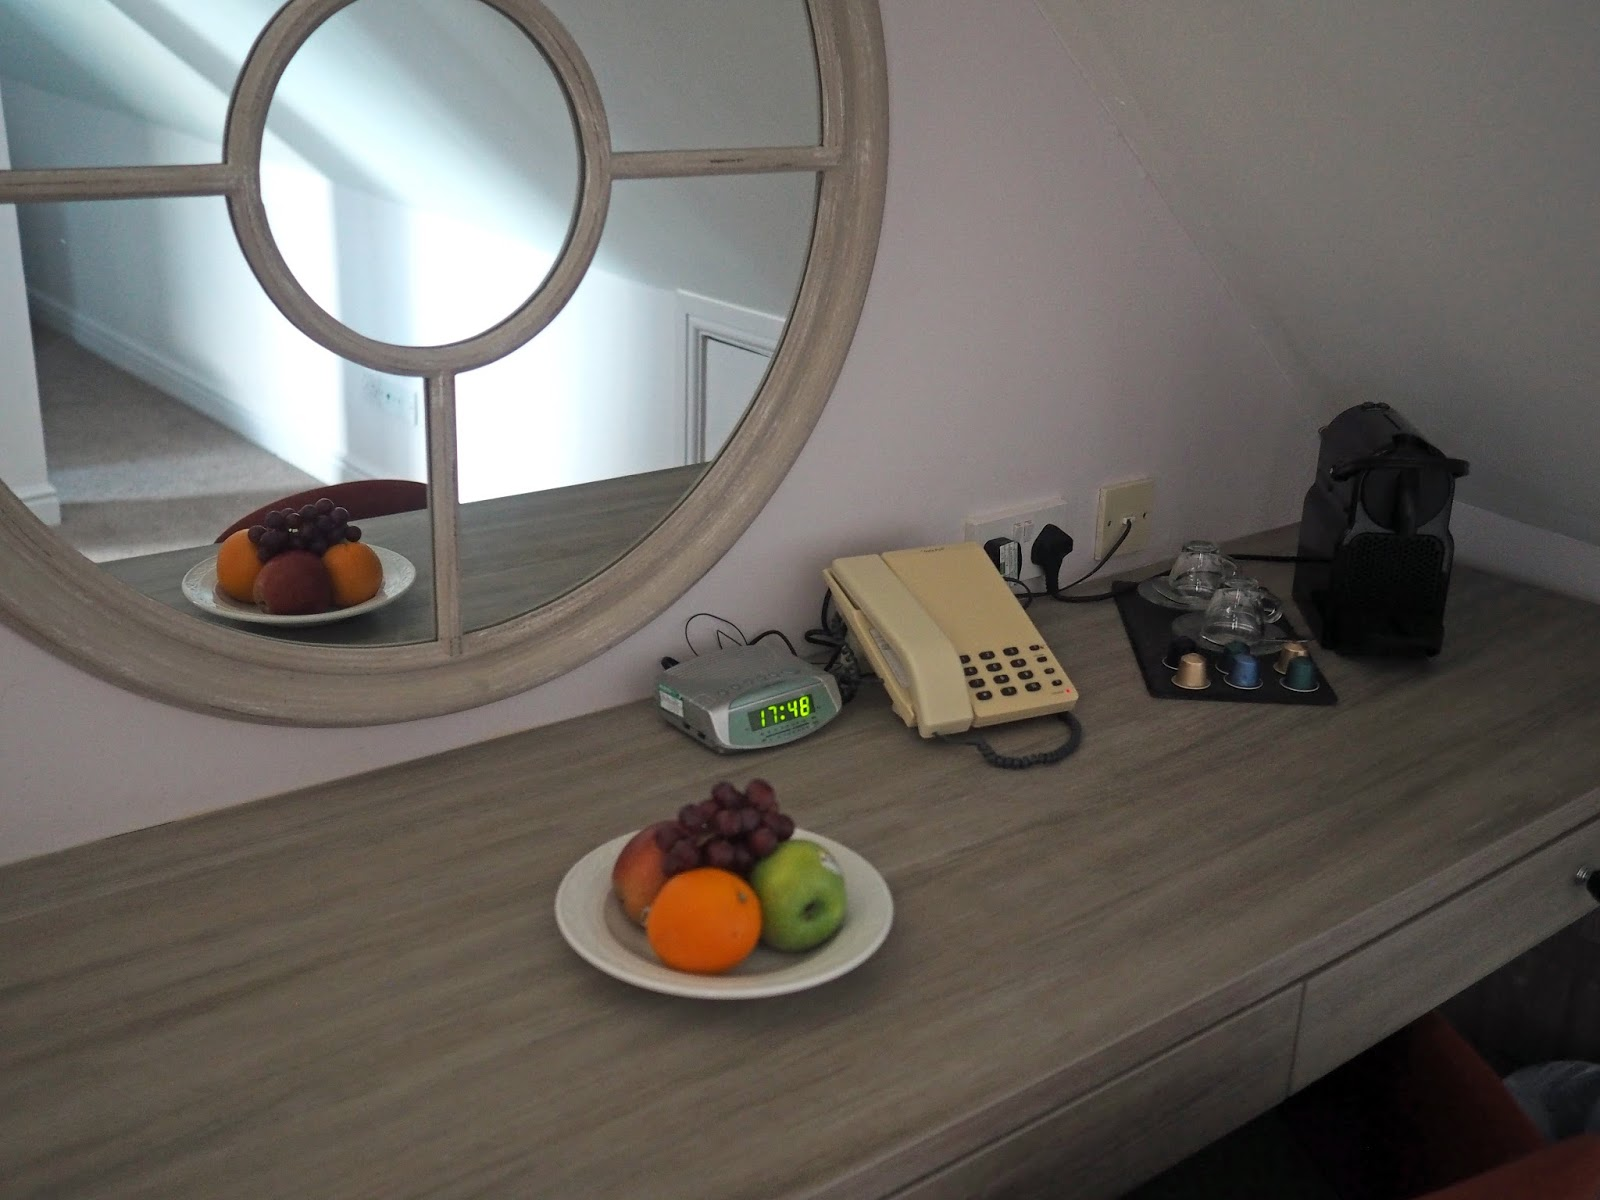 Hotel suite bedroom dressing area at Monk Bar Hotel, York